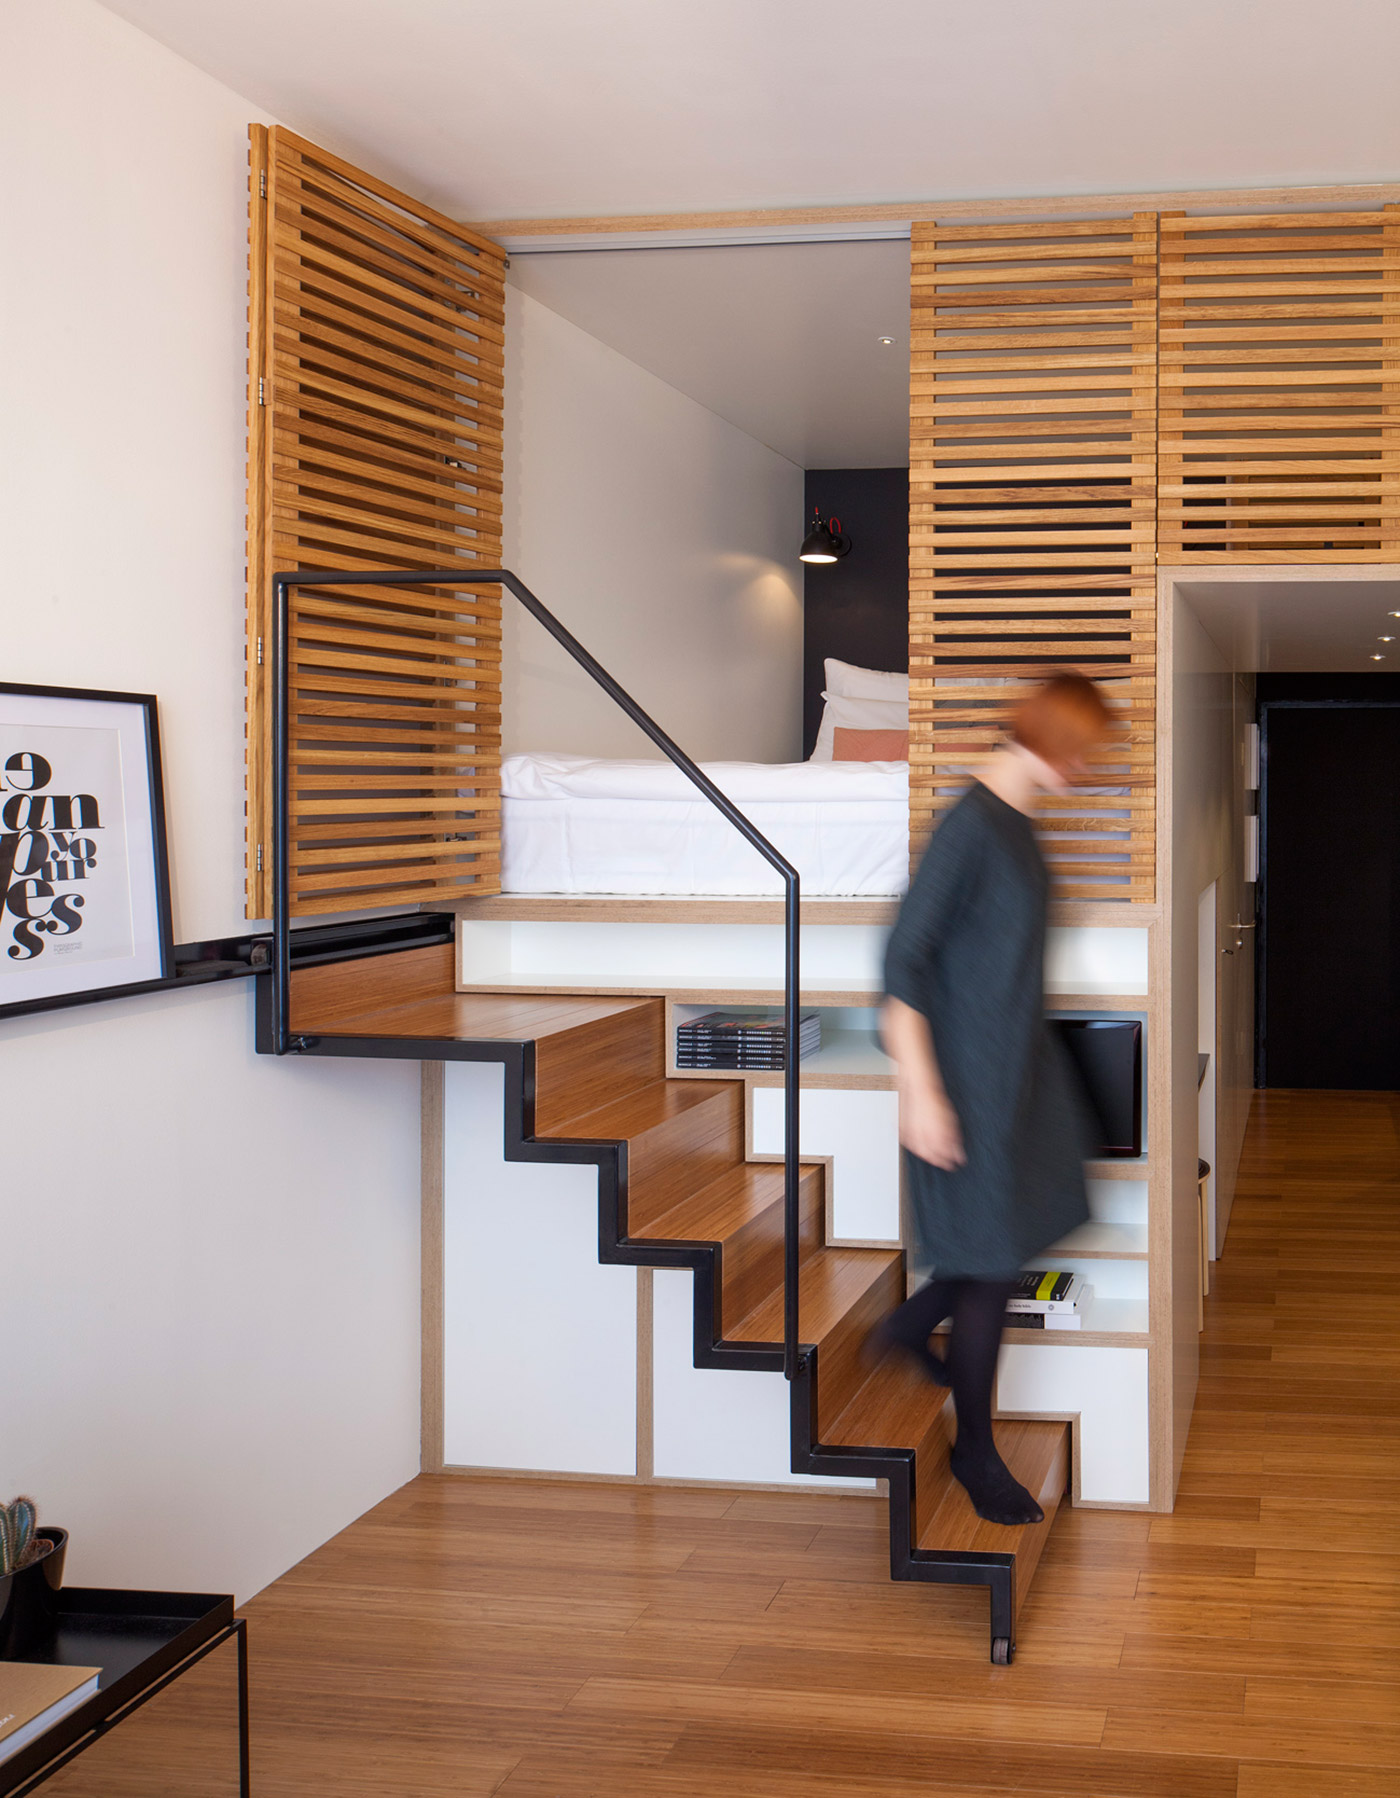 Modern wood paneling interior design ideas - Wood paneling ideas modern ...